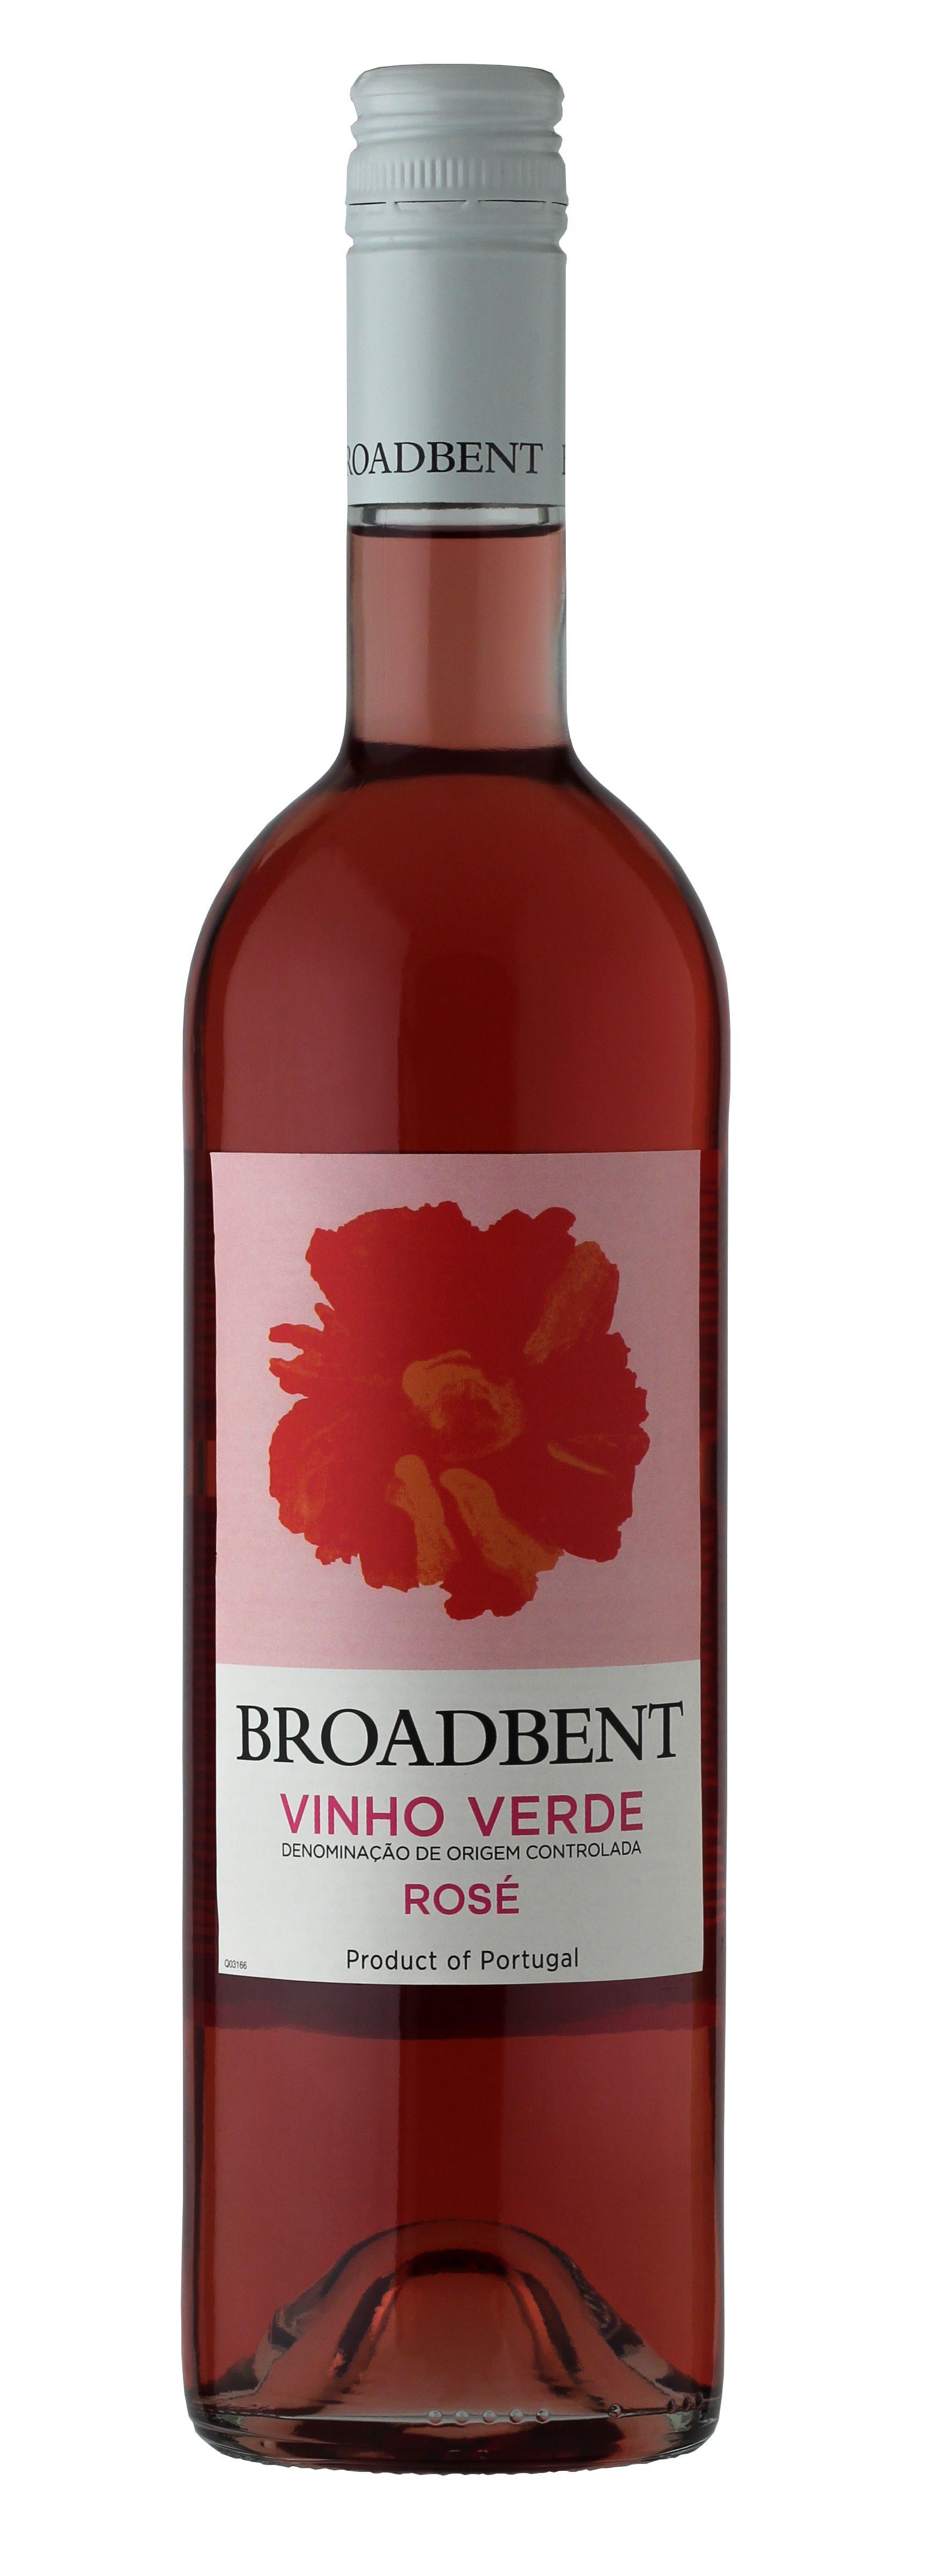 Broadbent Vinho Verde Rose Vino Rosado Vinos